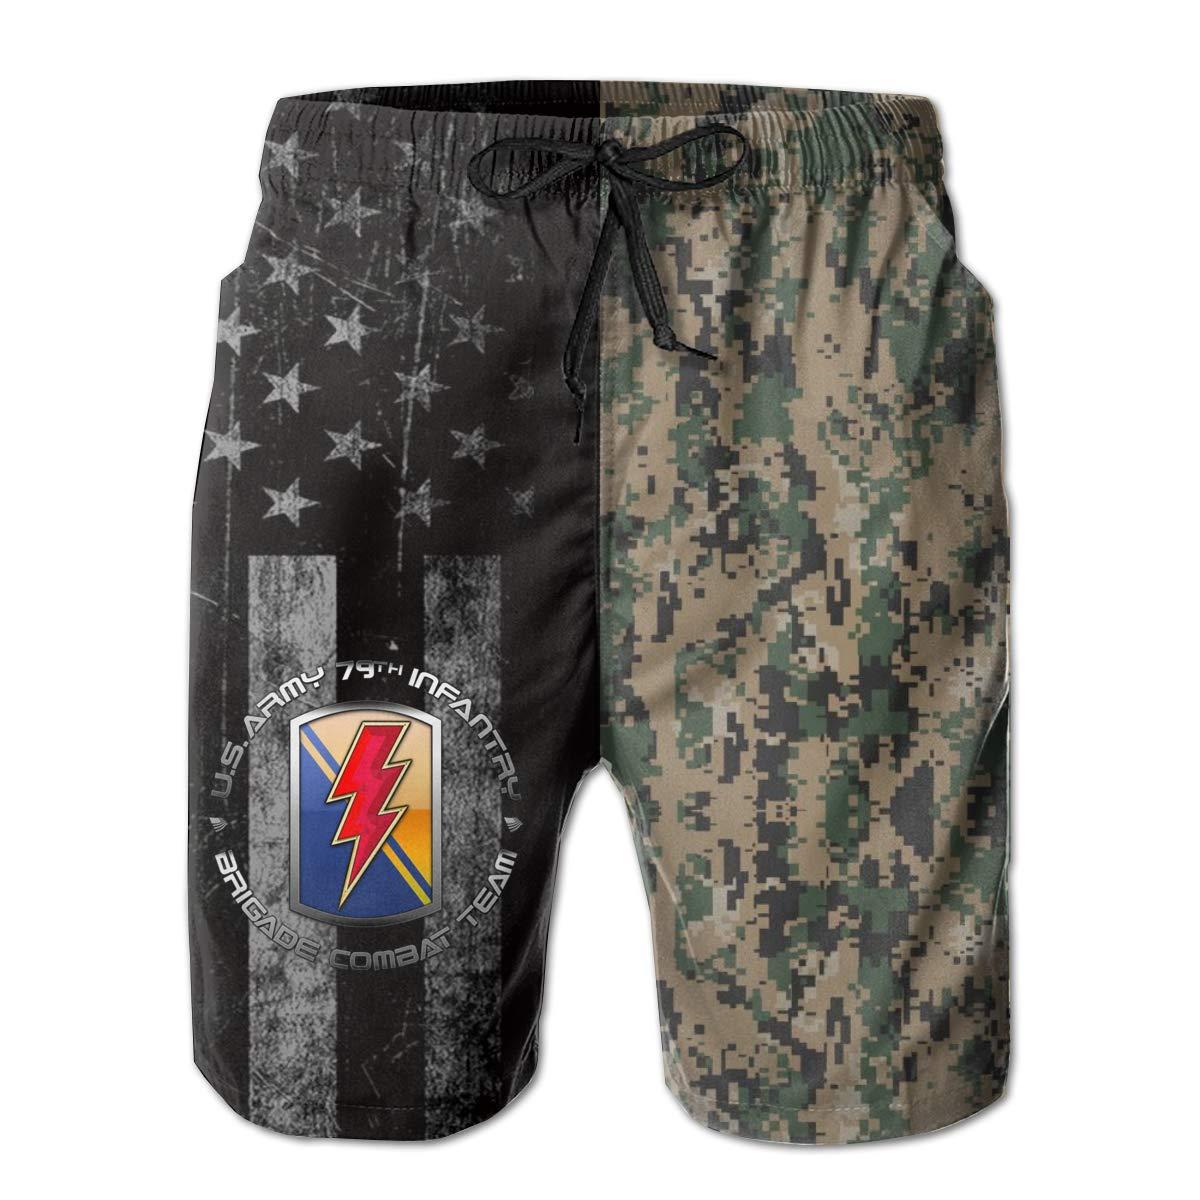 79th Infantry Brigade SSI Mens Swim Trunks Beach Short Board Shorts